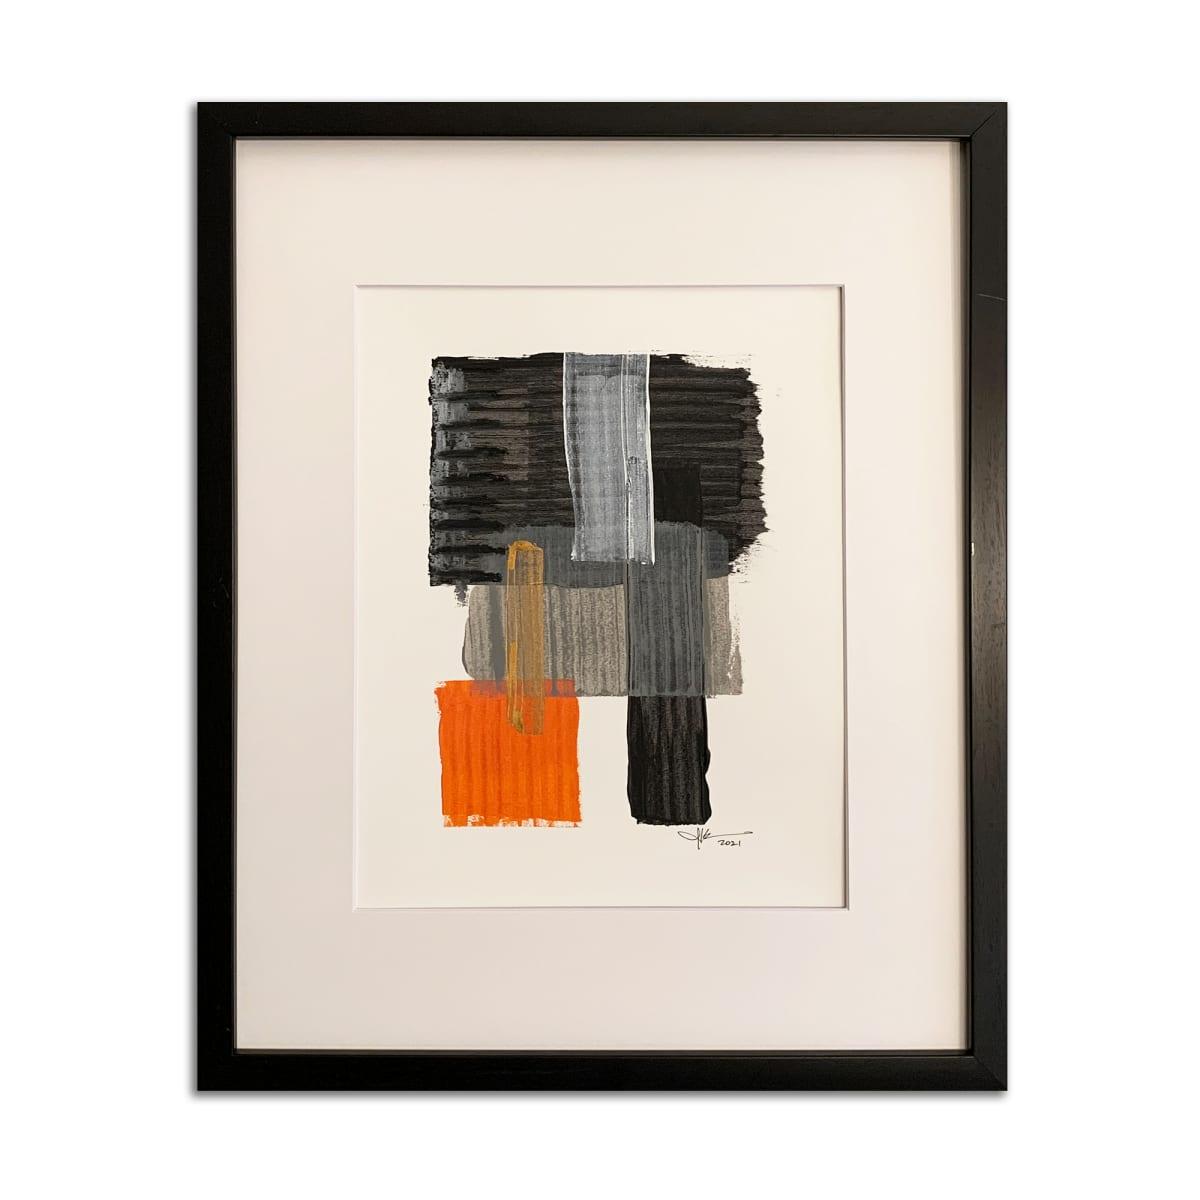 Untitled 57 by J. Kent Martin